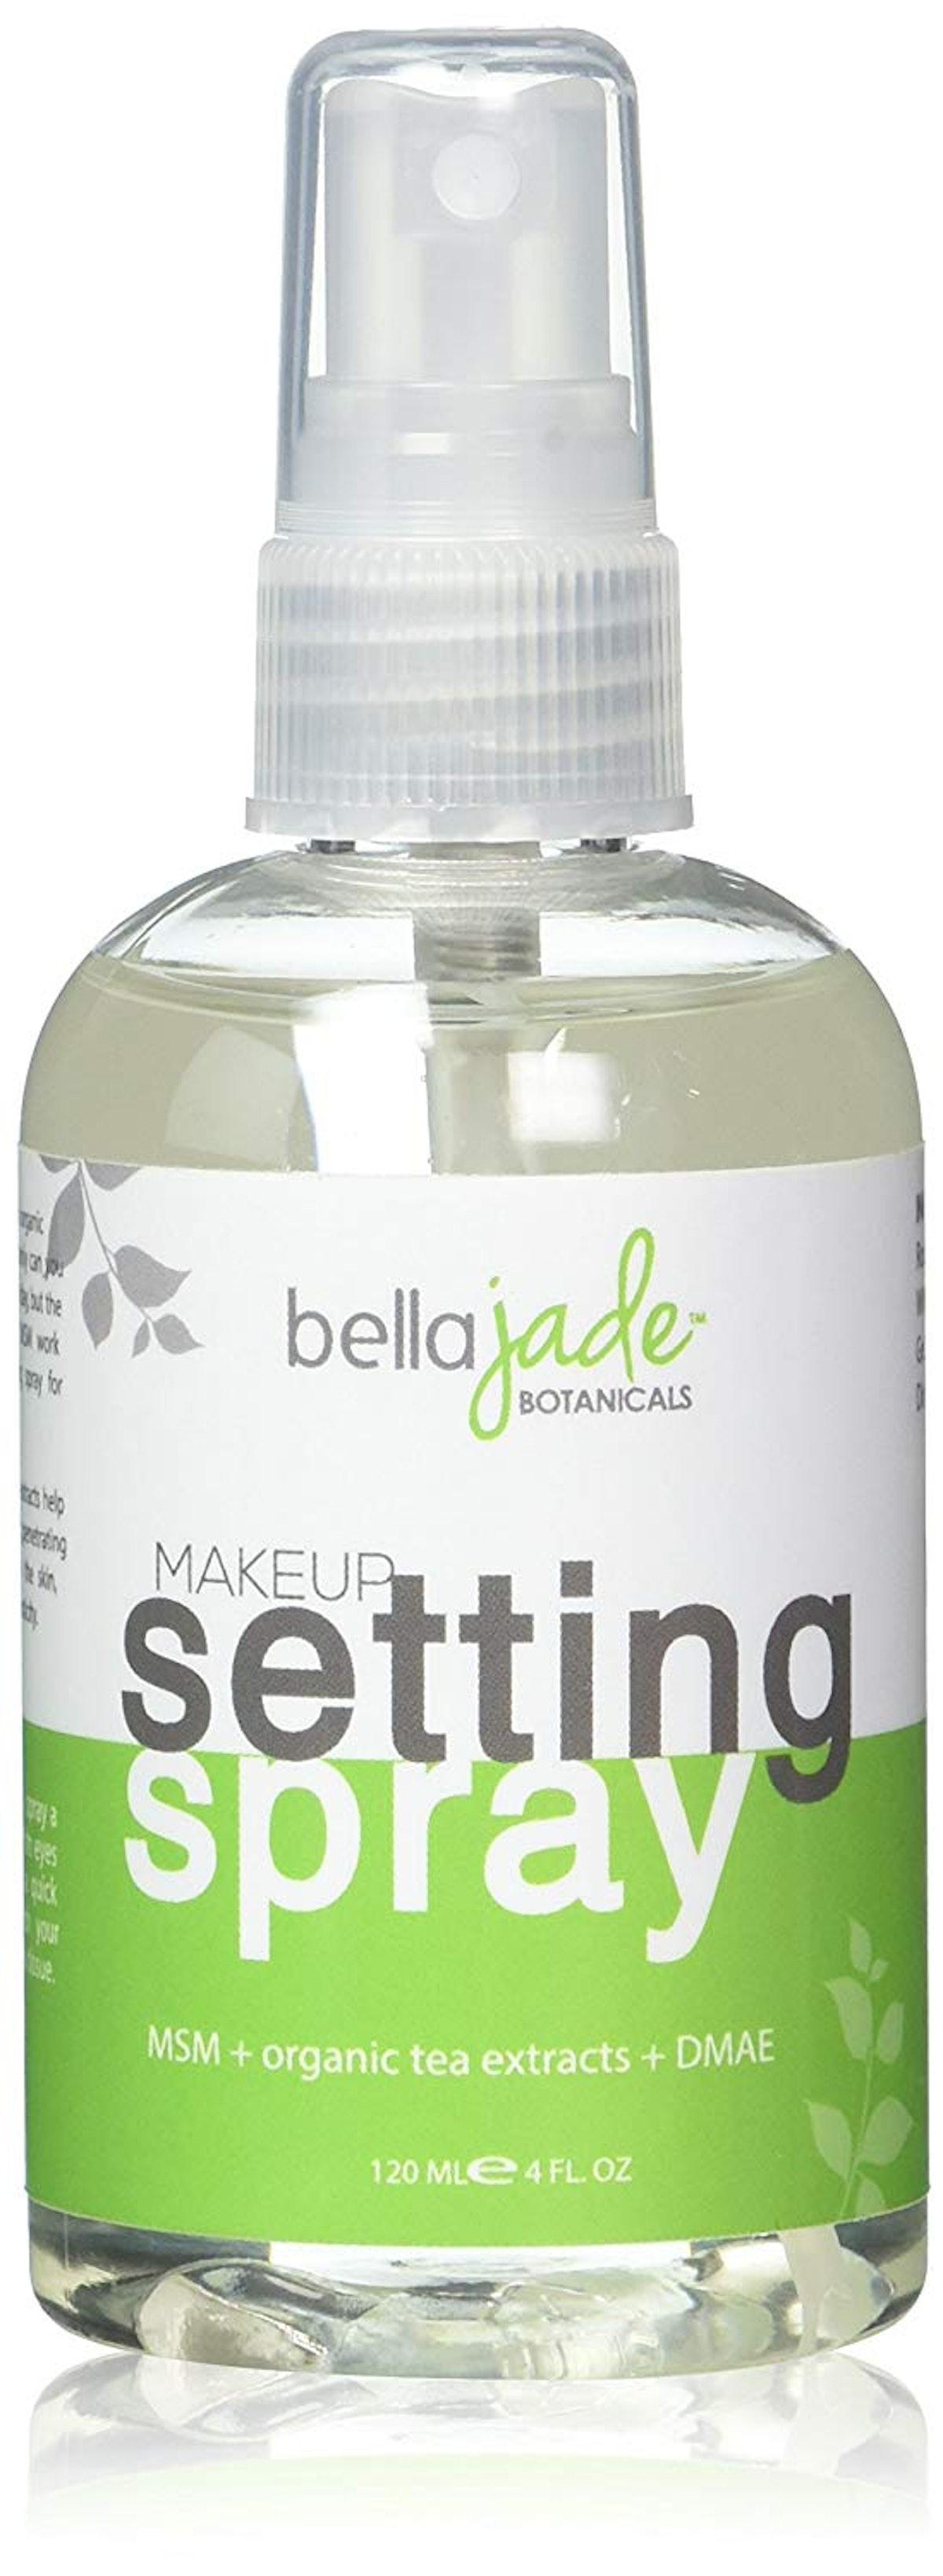 Bella Jade Botanicals Makeup Setting Spray